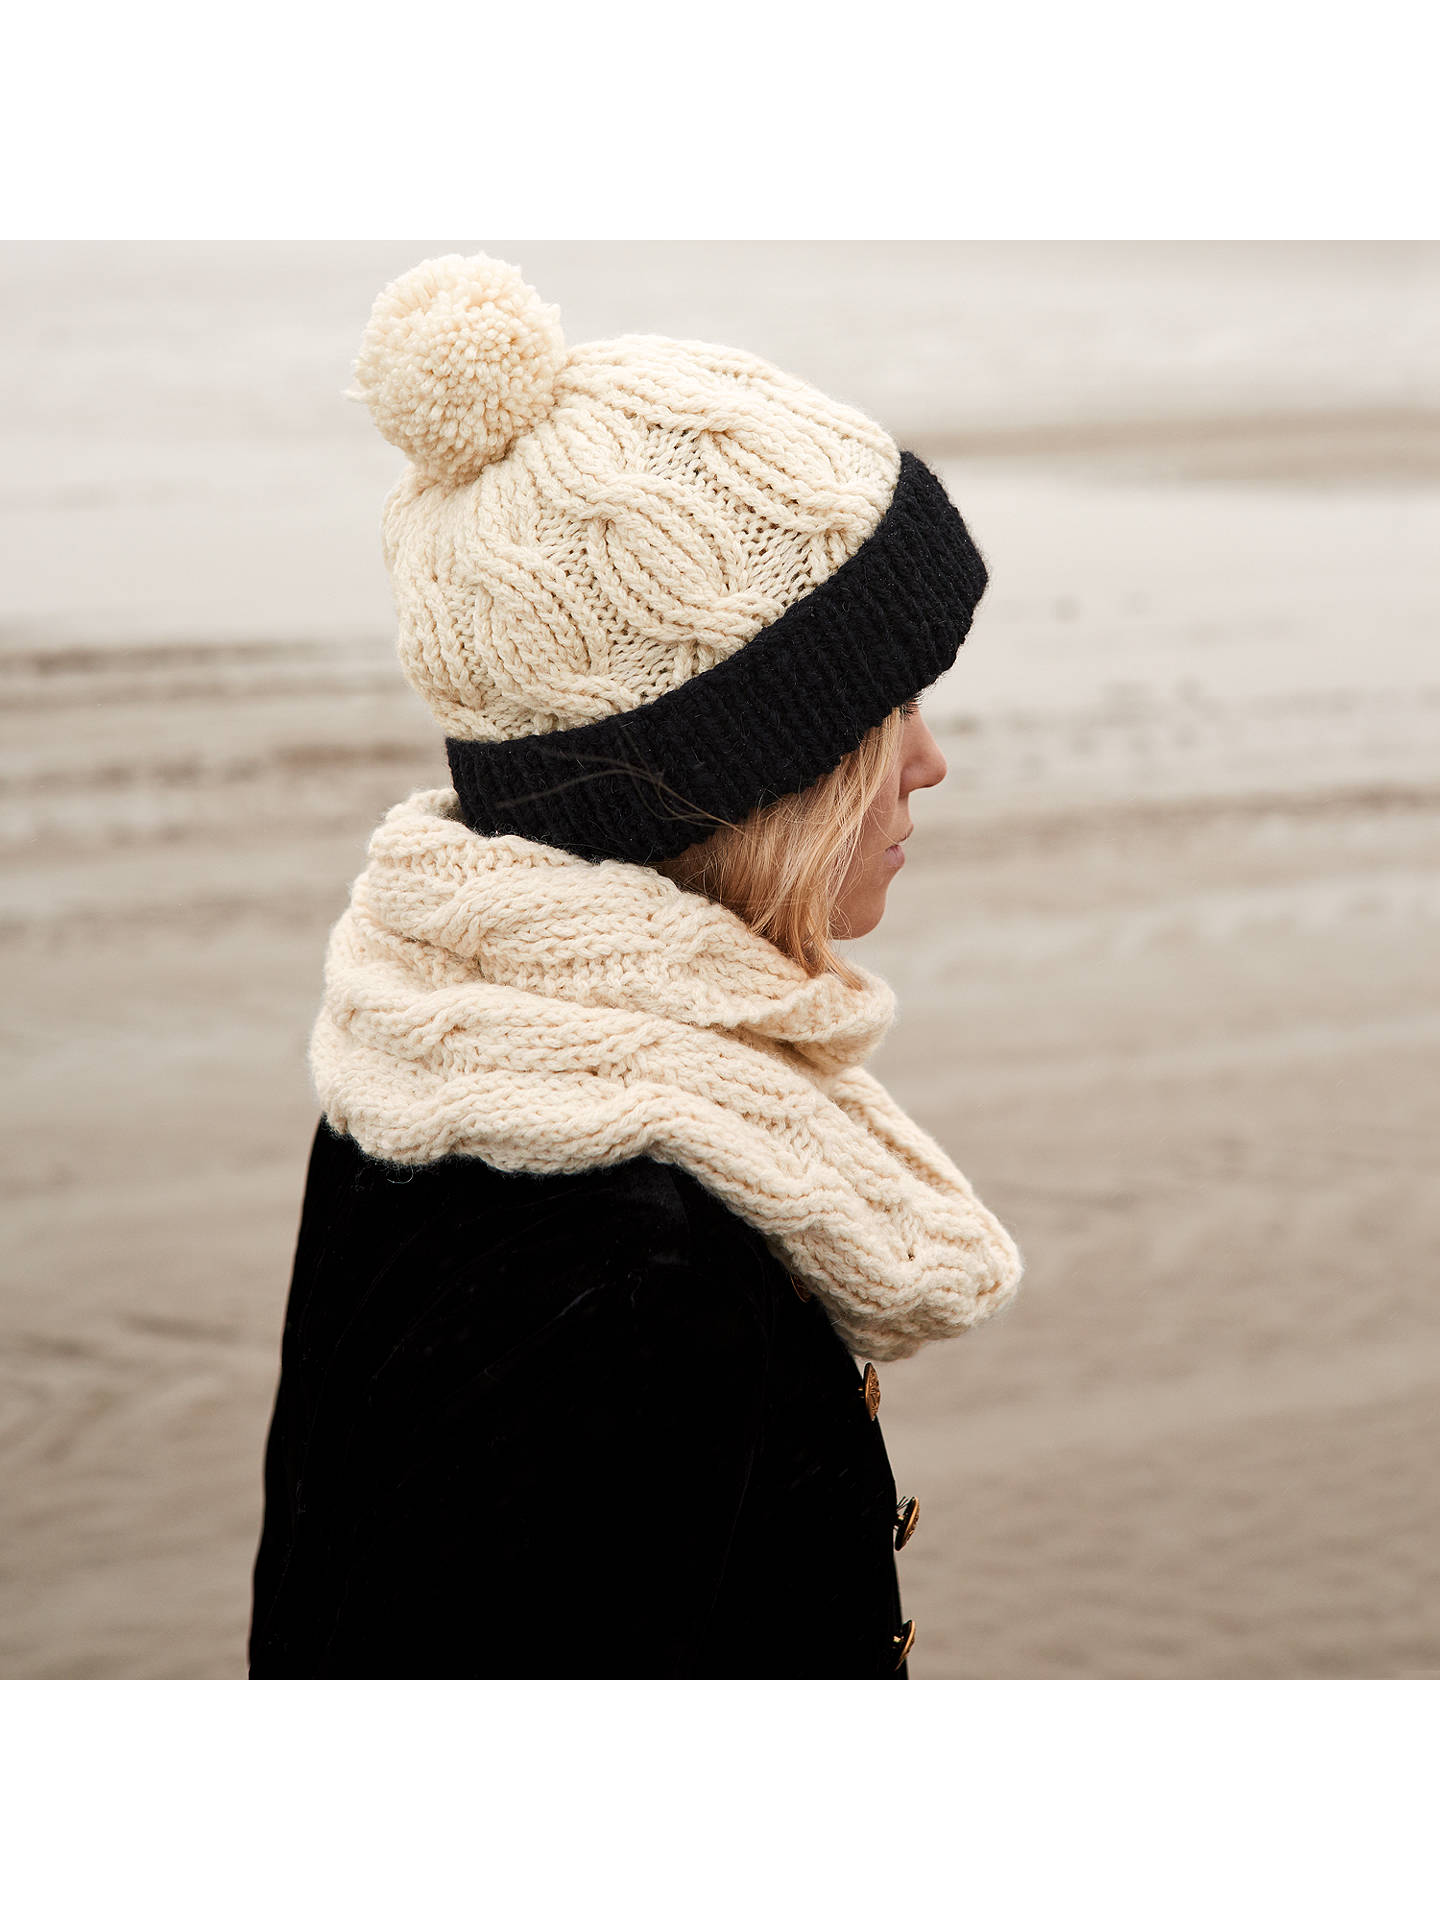 1ada9c683 ... Buy Rico Fashion Alpaca Dream Women s Hat and Jumper Knitting Pattern